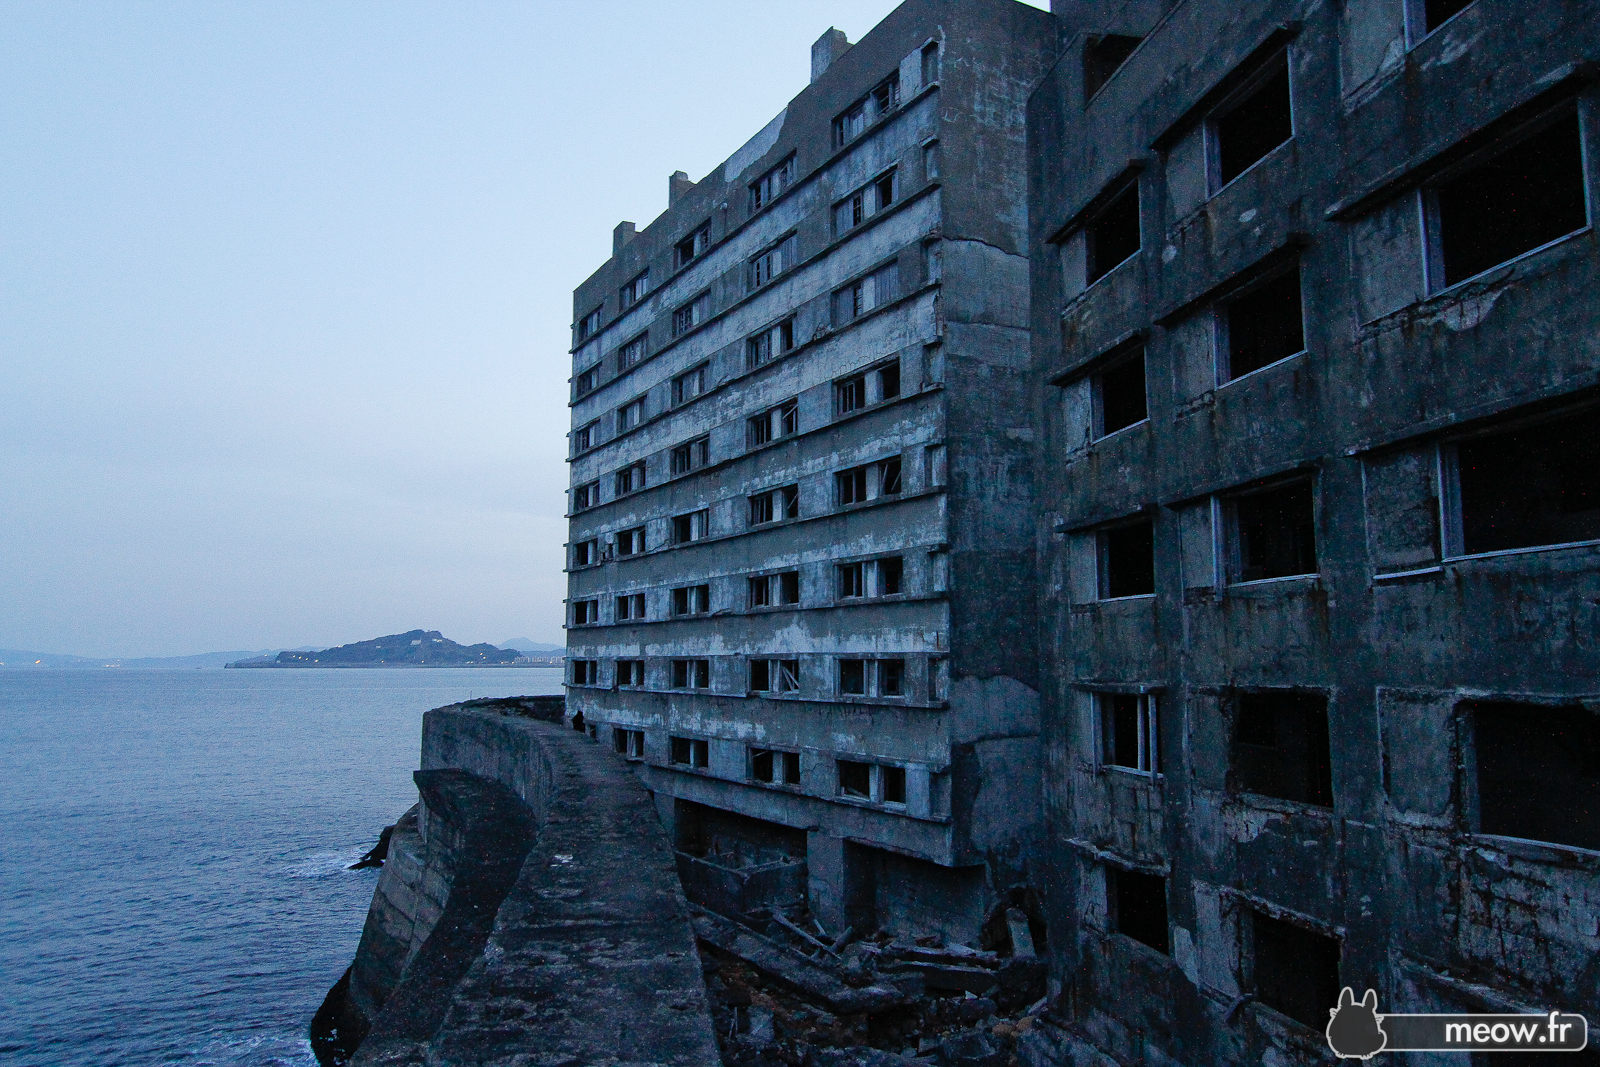 Hashima Battleship Island - From The Sea